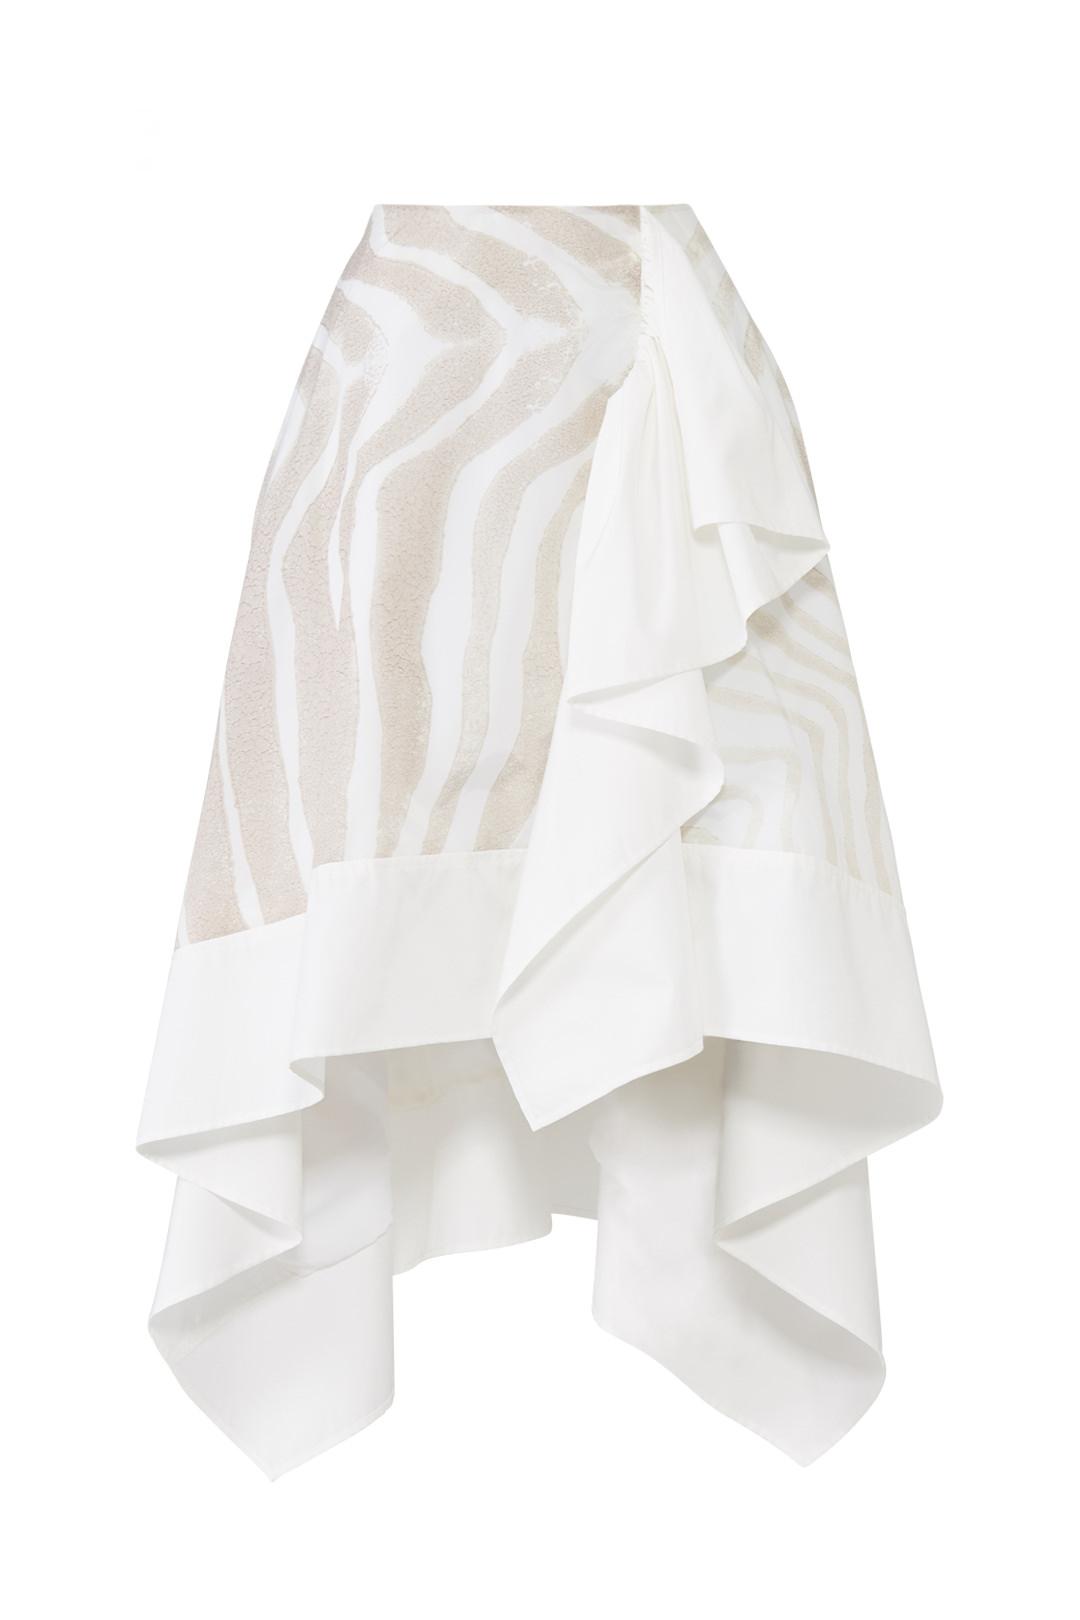 ADEAM Asymmetrical Ruffle Skirt - Idk this just looks really chic lol